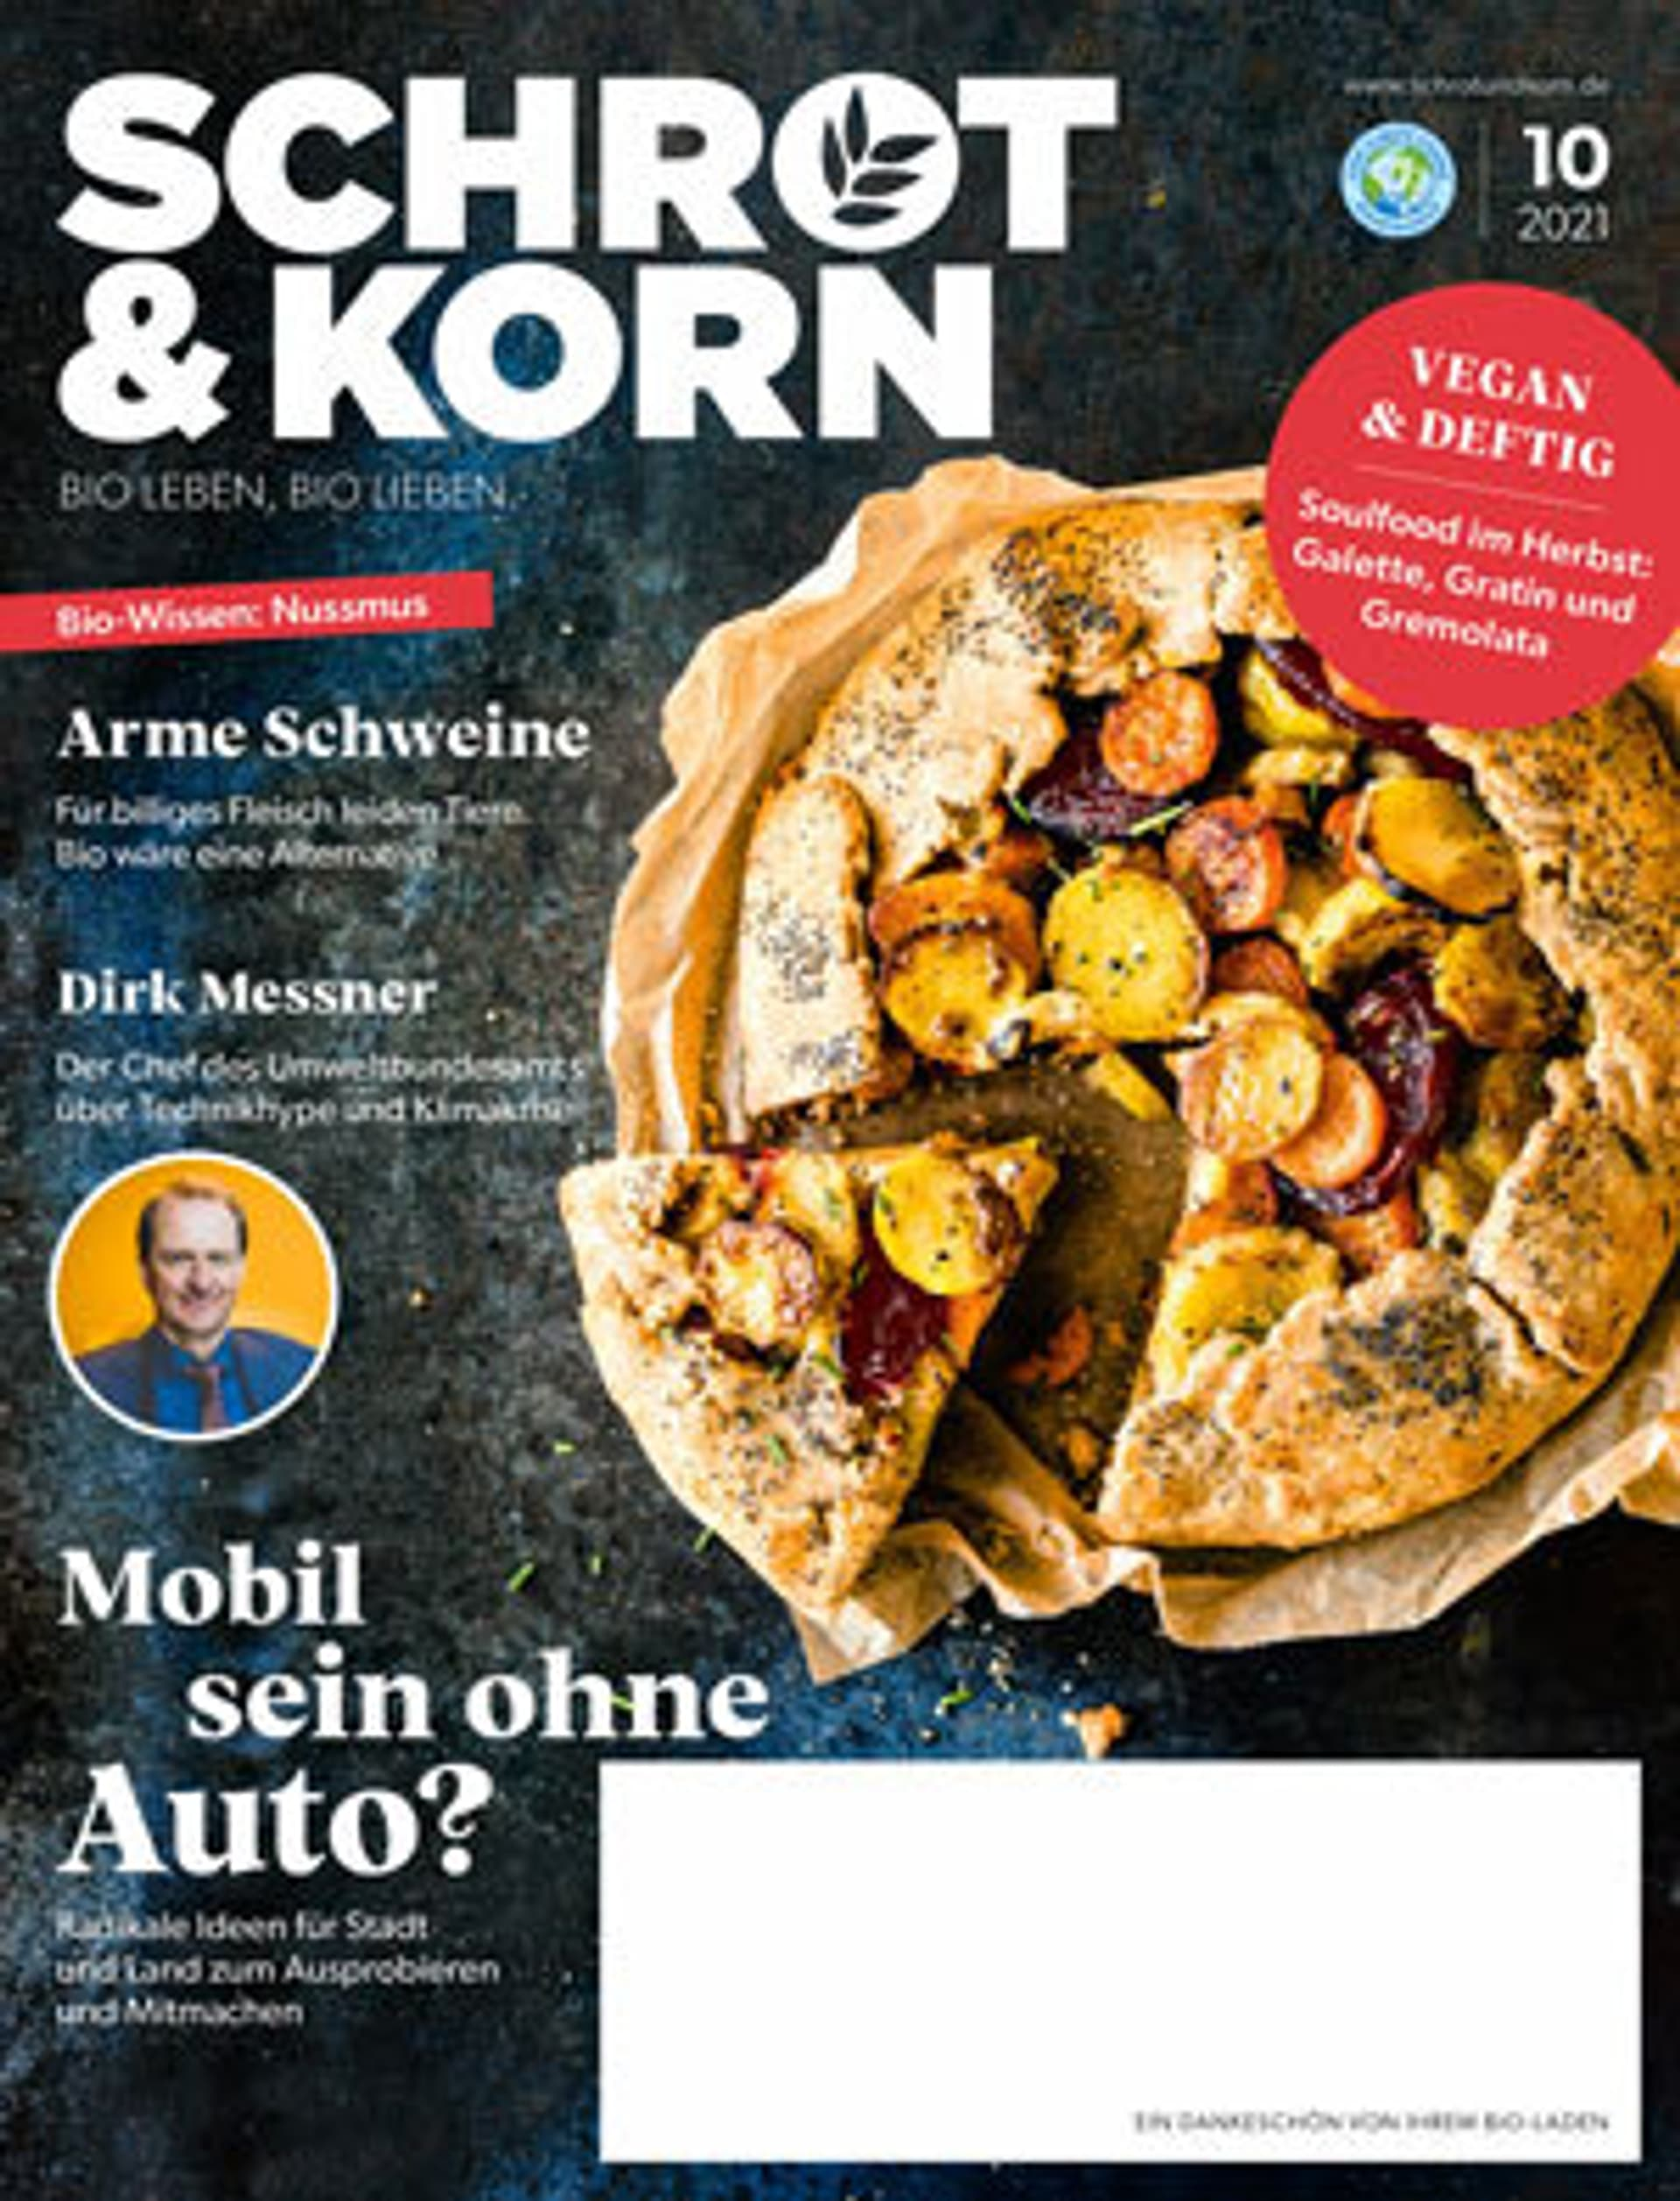 Schrot&Korn Titel 10/2021